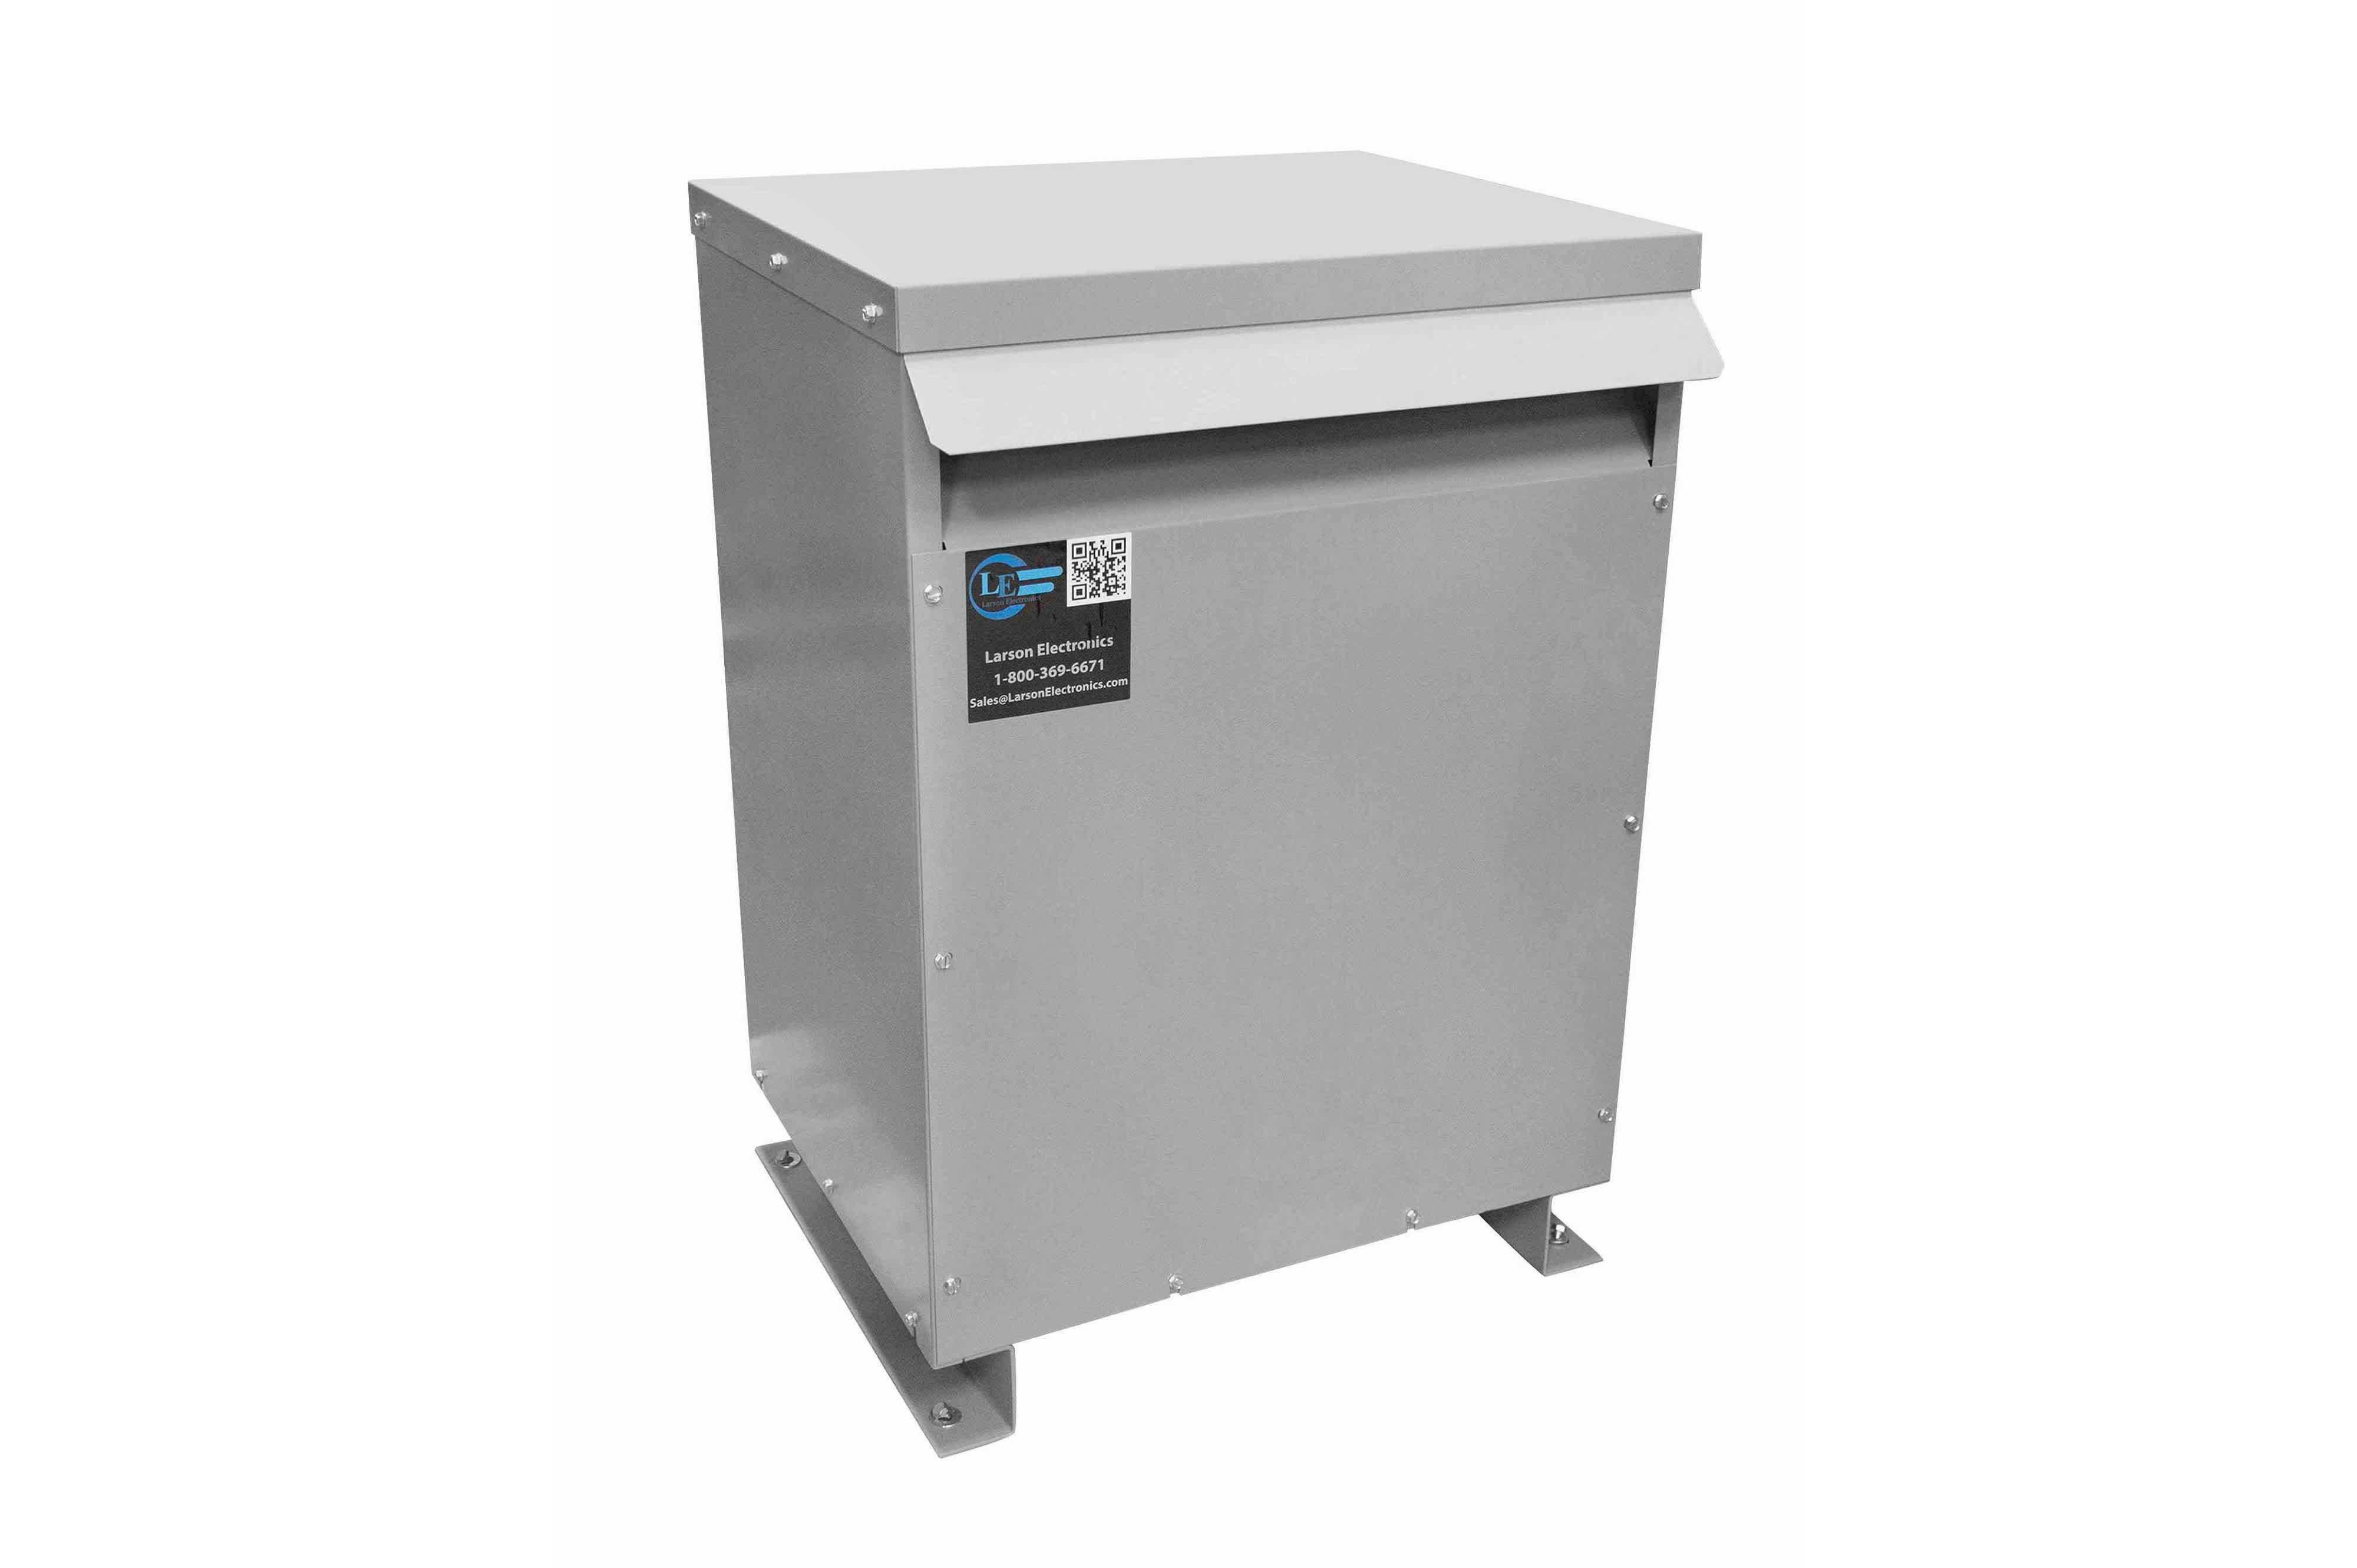 28 kVA 3PH Isolation Transformer, 575V Wye Primary, 415Y/240 Wye-N Secondary, N3R, Ventilated, 60 Hz